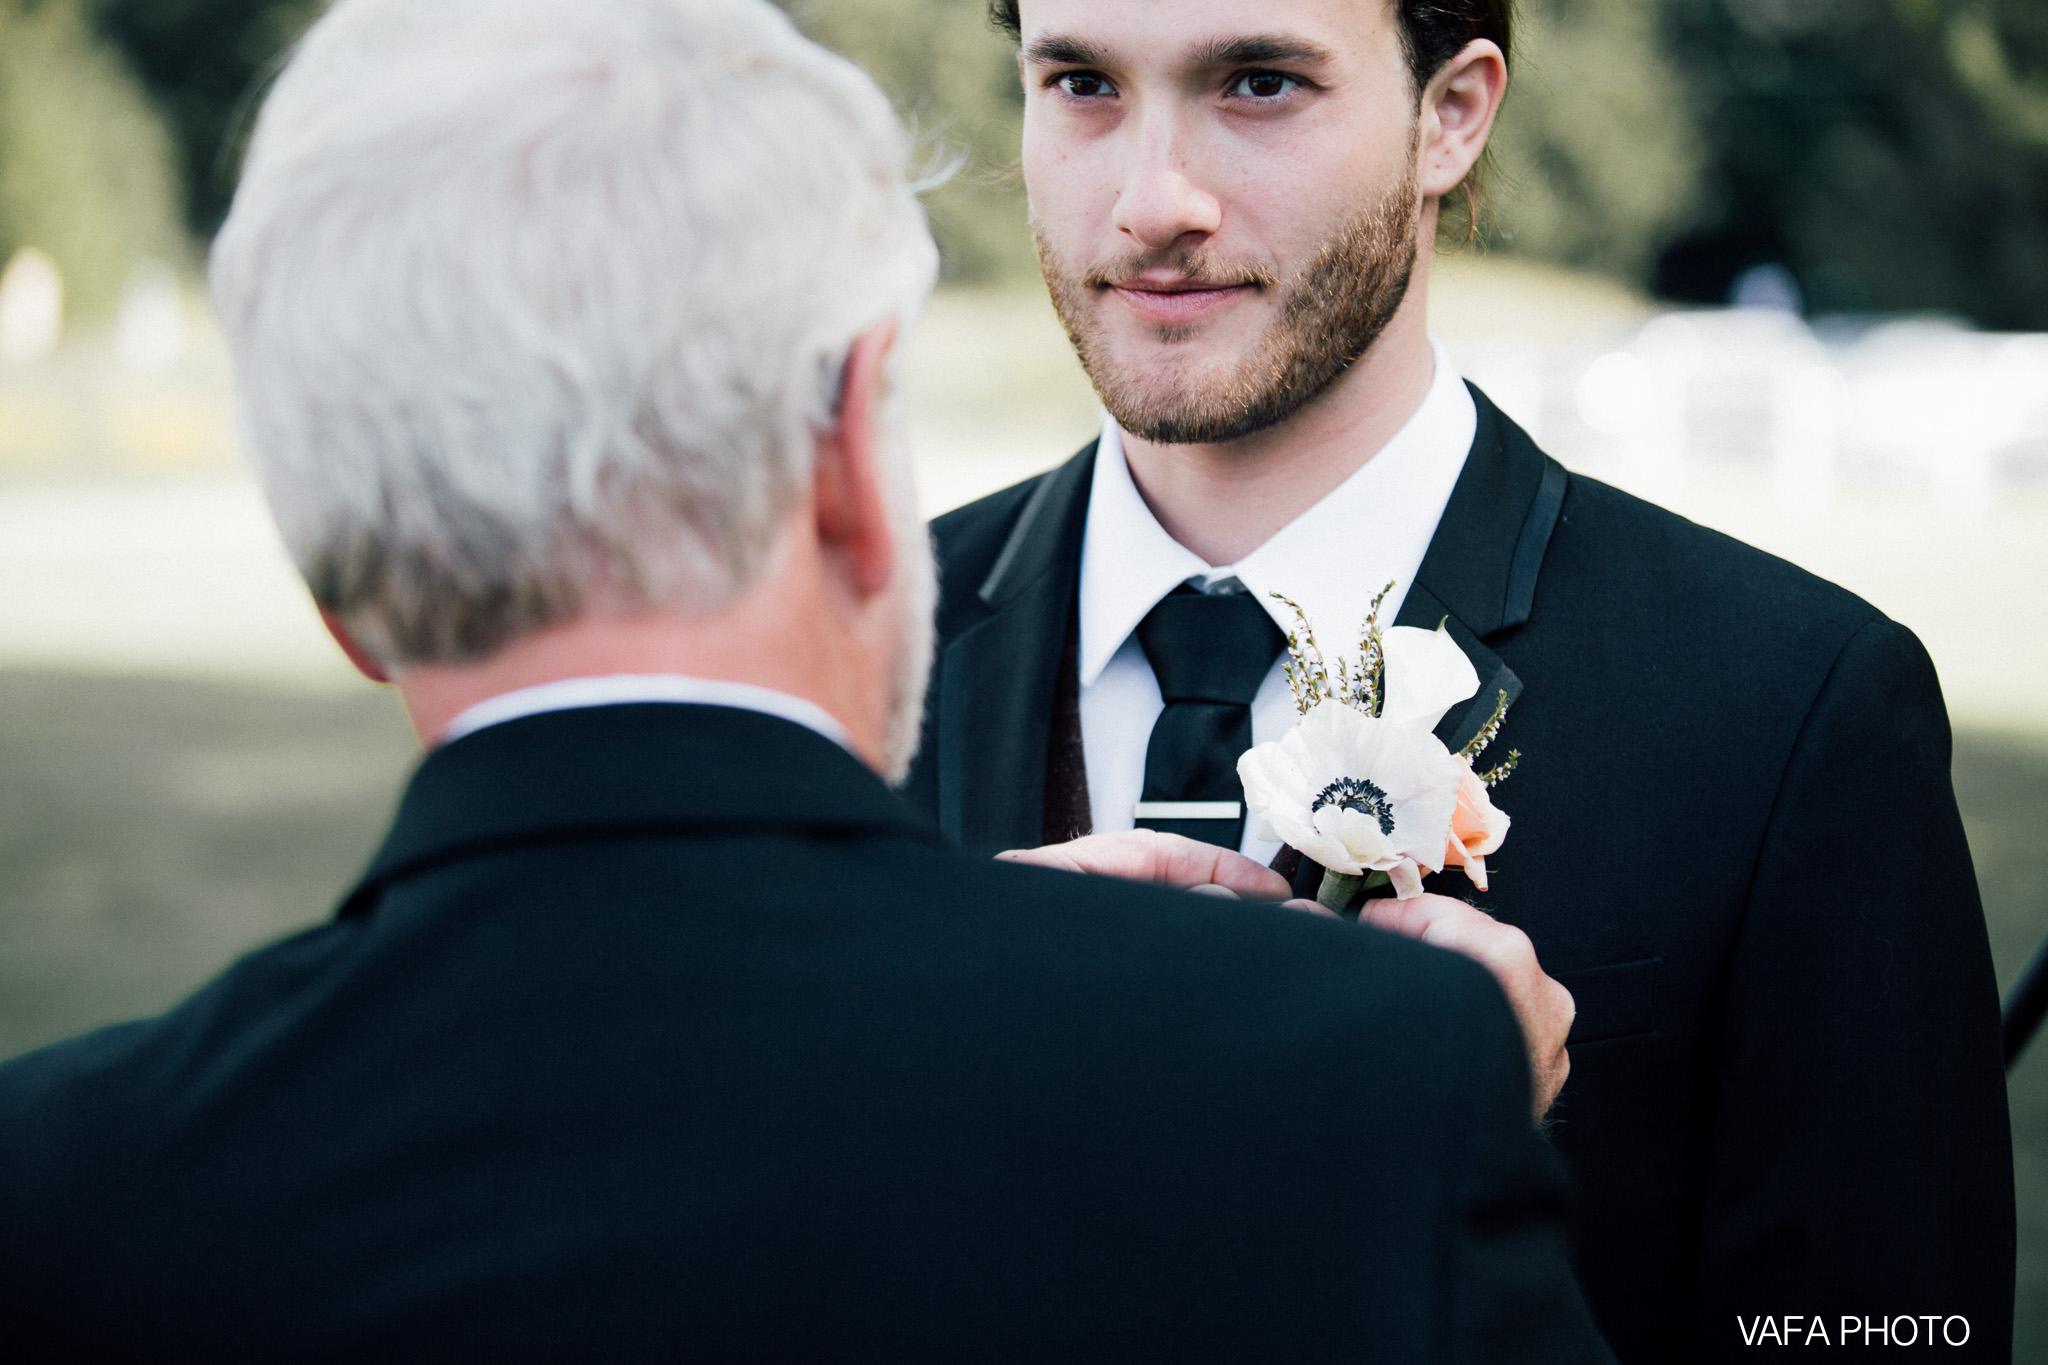 The-Felt-Estate-Wedding-Kailie-David-Vafa-Photo-203.jpg